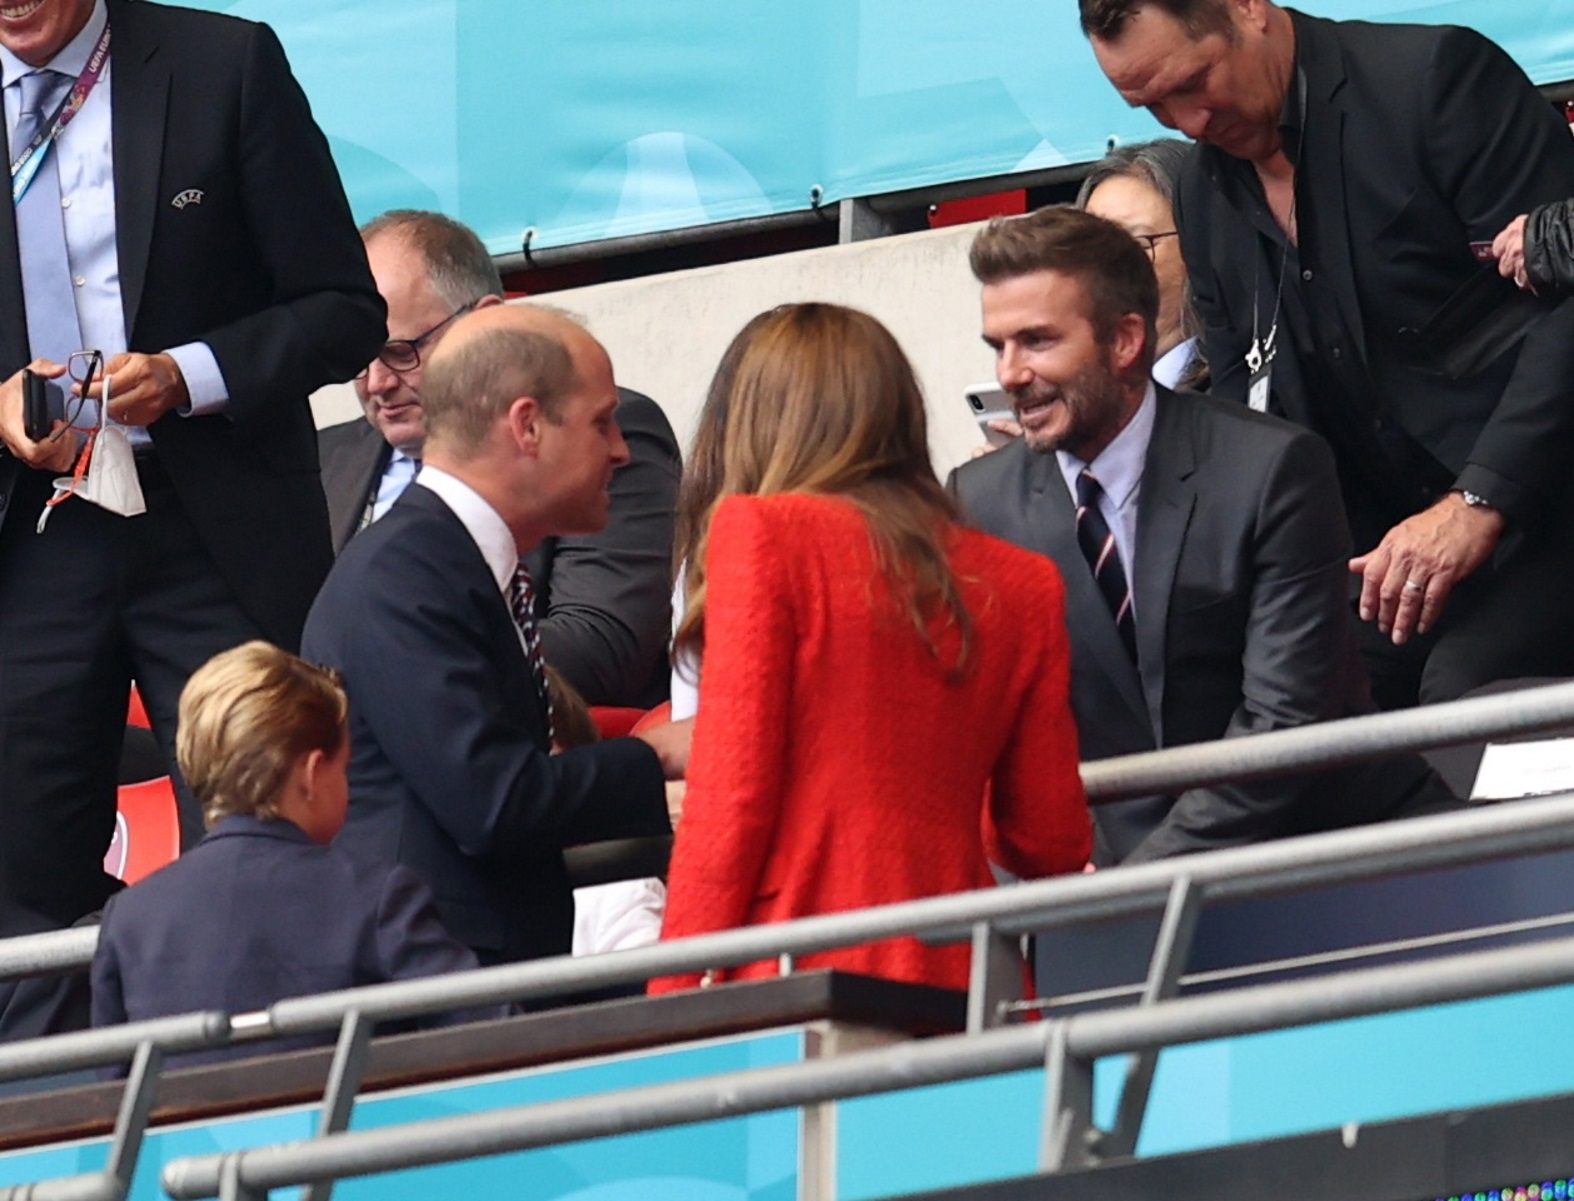 Euro 2020: Πρίγκιπας Ουίλιαμ και Κέιτ Μίντλετον χειροκροτούν τη νίκη της Αγγλίας επί της Γερμανίας (pics)